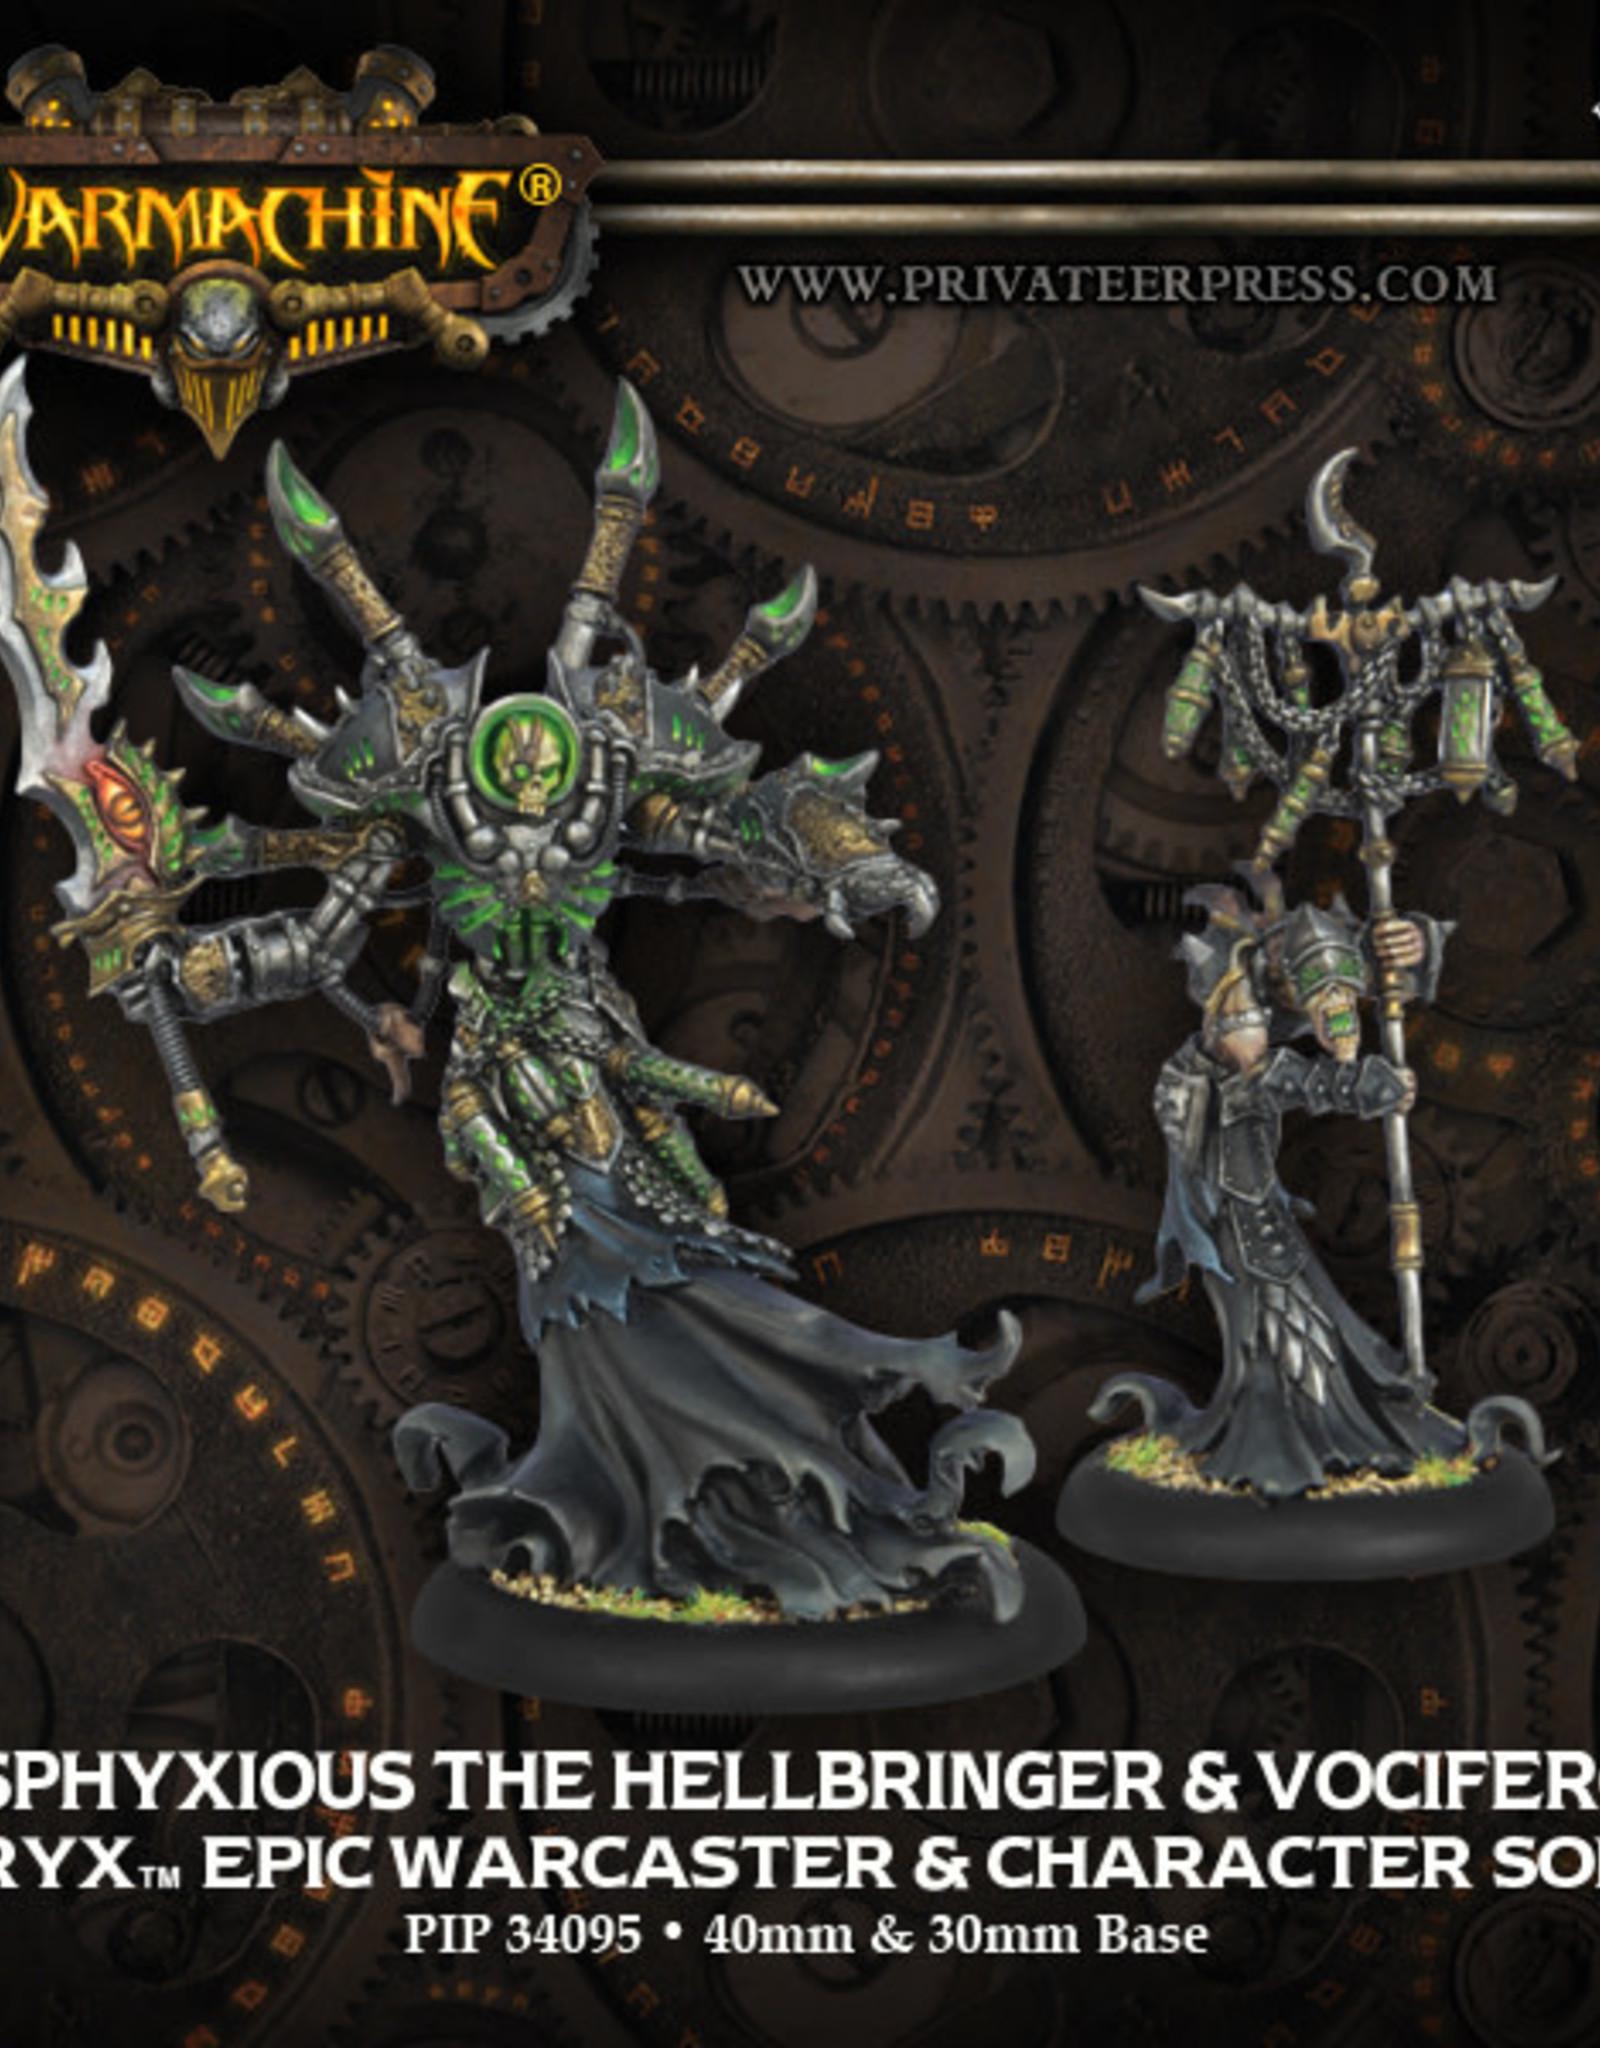 Warmachine Cryx - Asphyxious & Vociferon